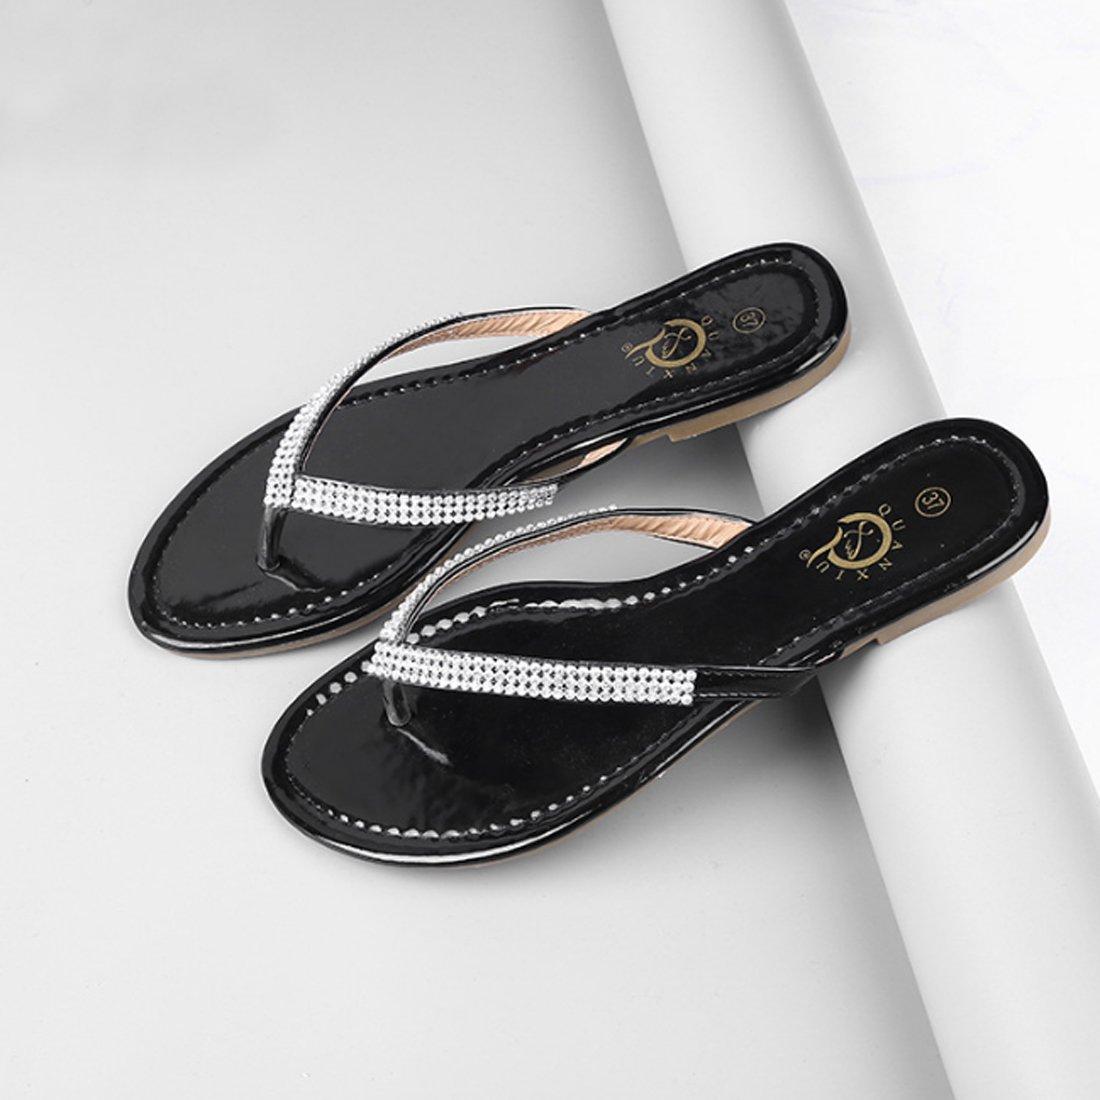 ded7c1a1c731f3 ... Niceful Women s Flat Rhinestone Flip Flops PU Large Size Casual Casual  Casual Summer Sandals B07BKXNPYH 8.5 ...